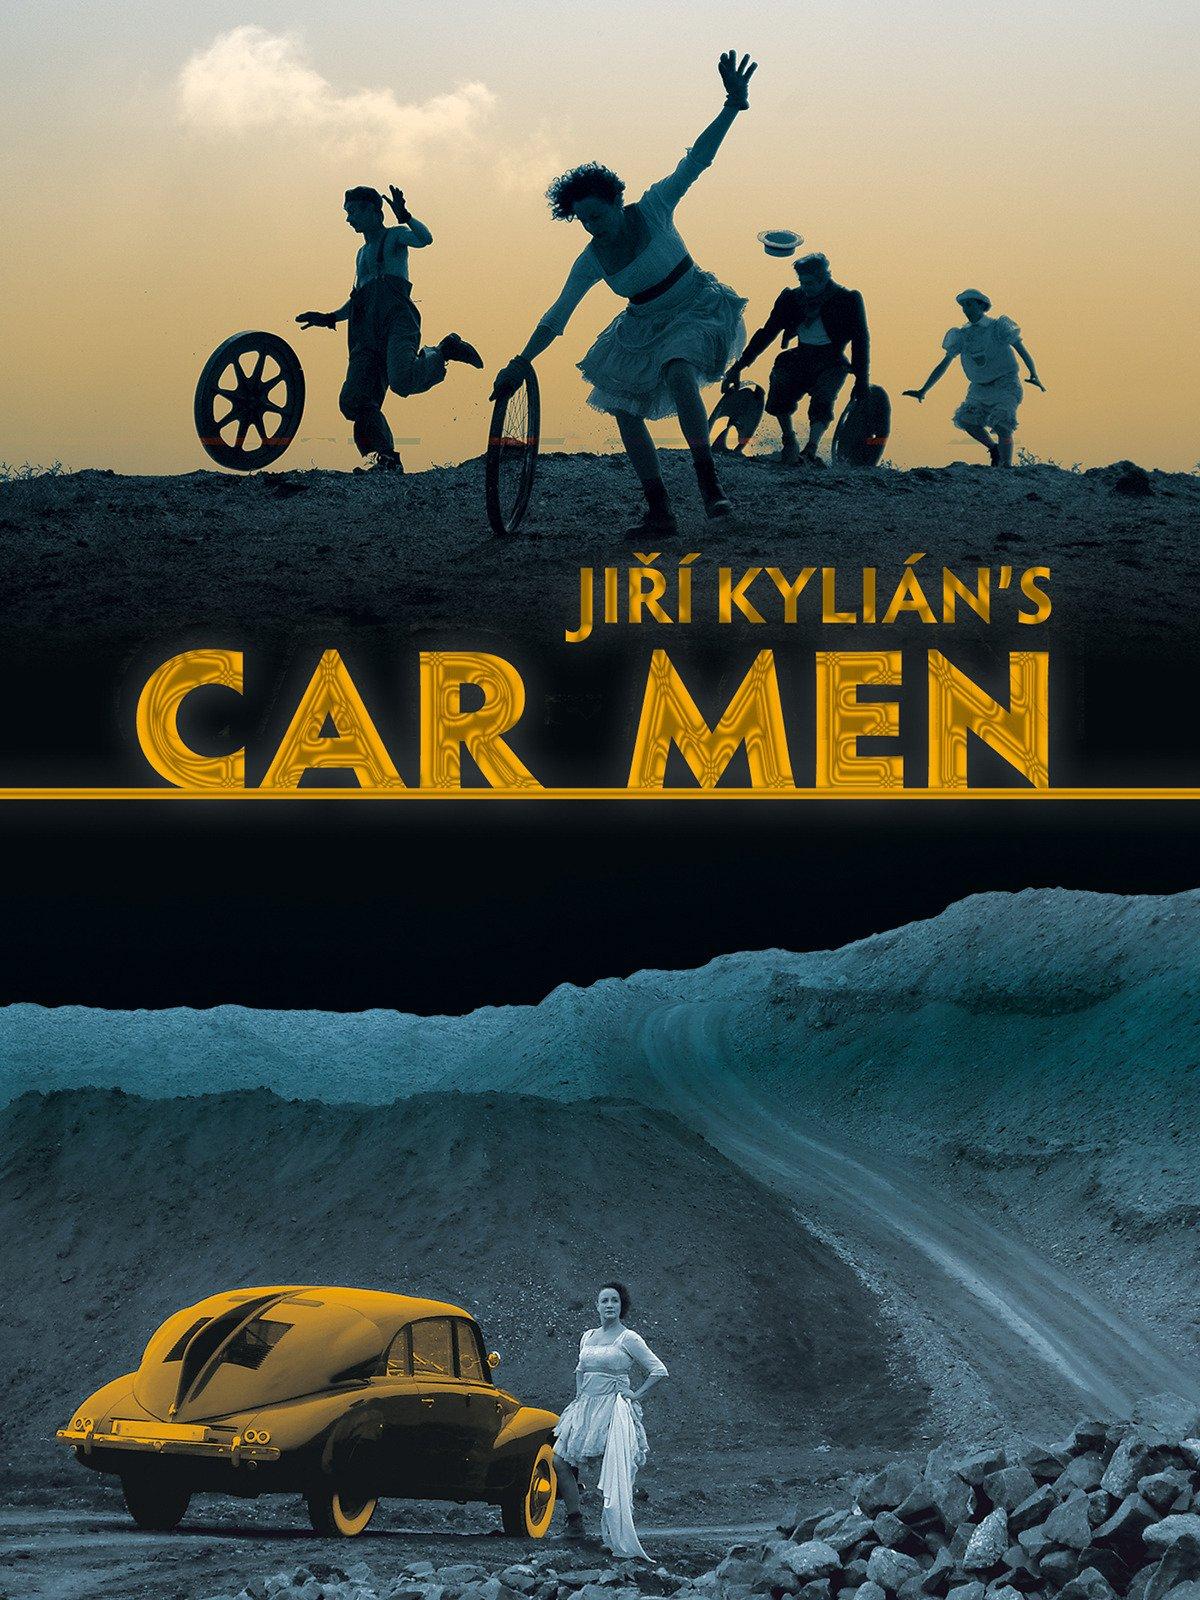 Jiří Kylián's Car Men